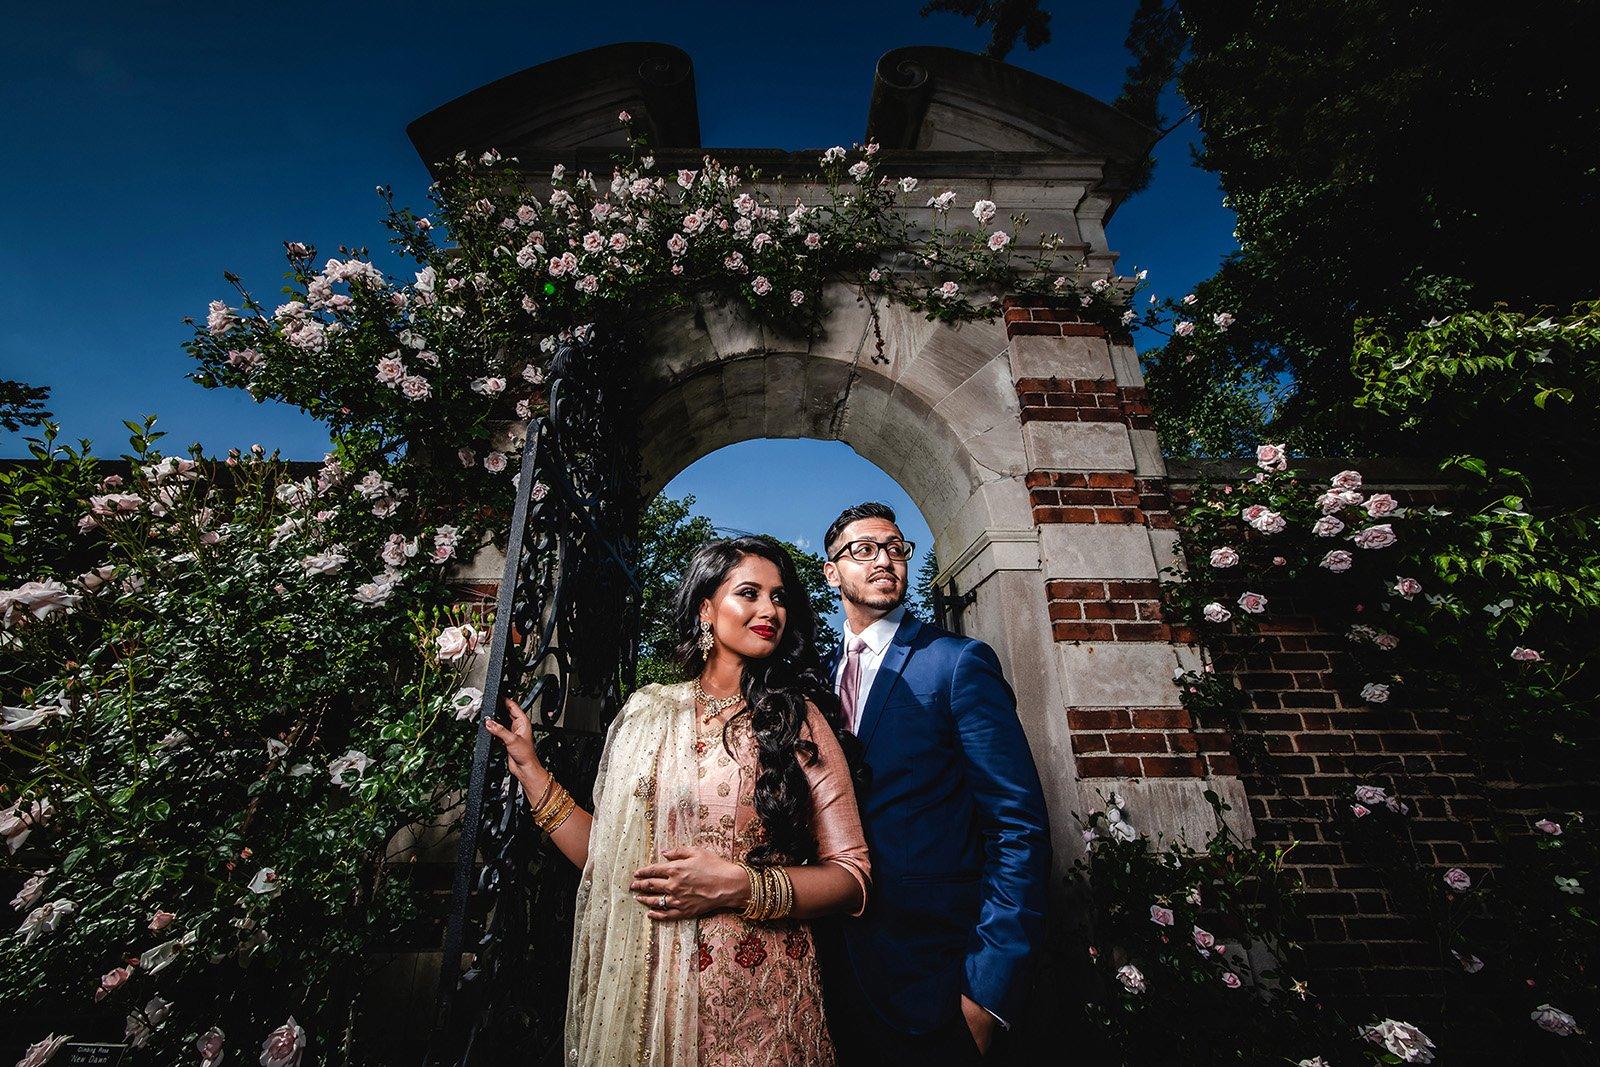 Old-Westbury-Garden-Pre-Wedding-Shoot Engagement